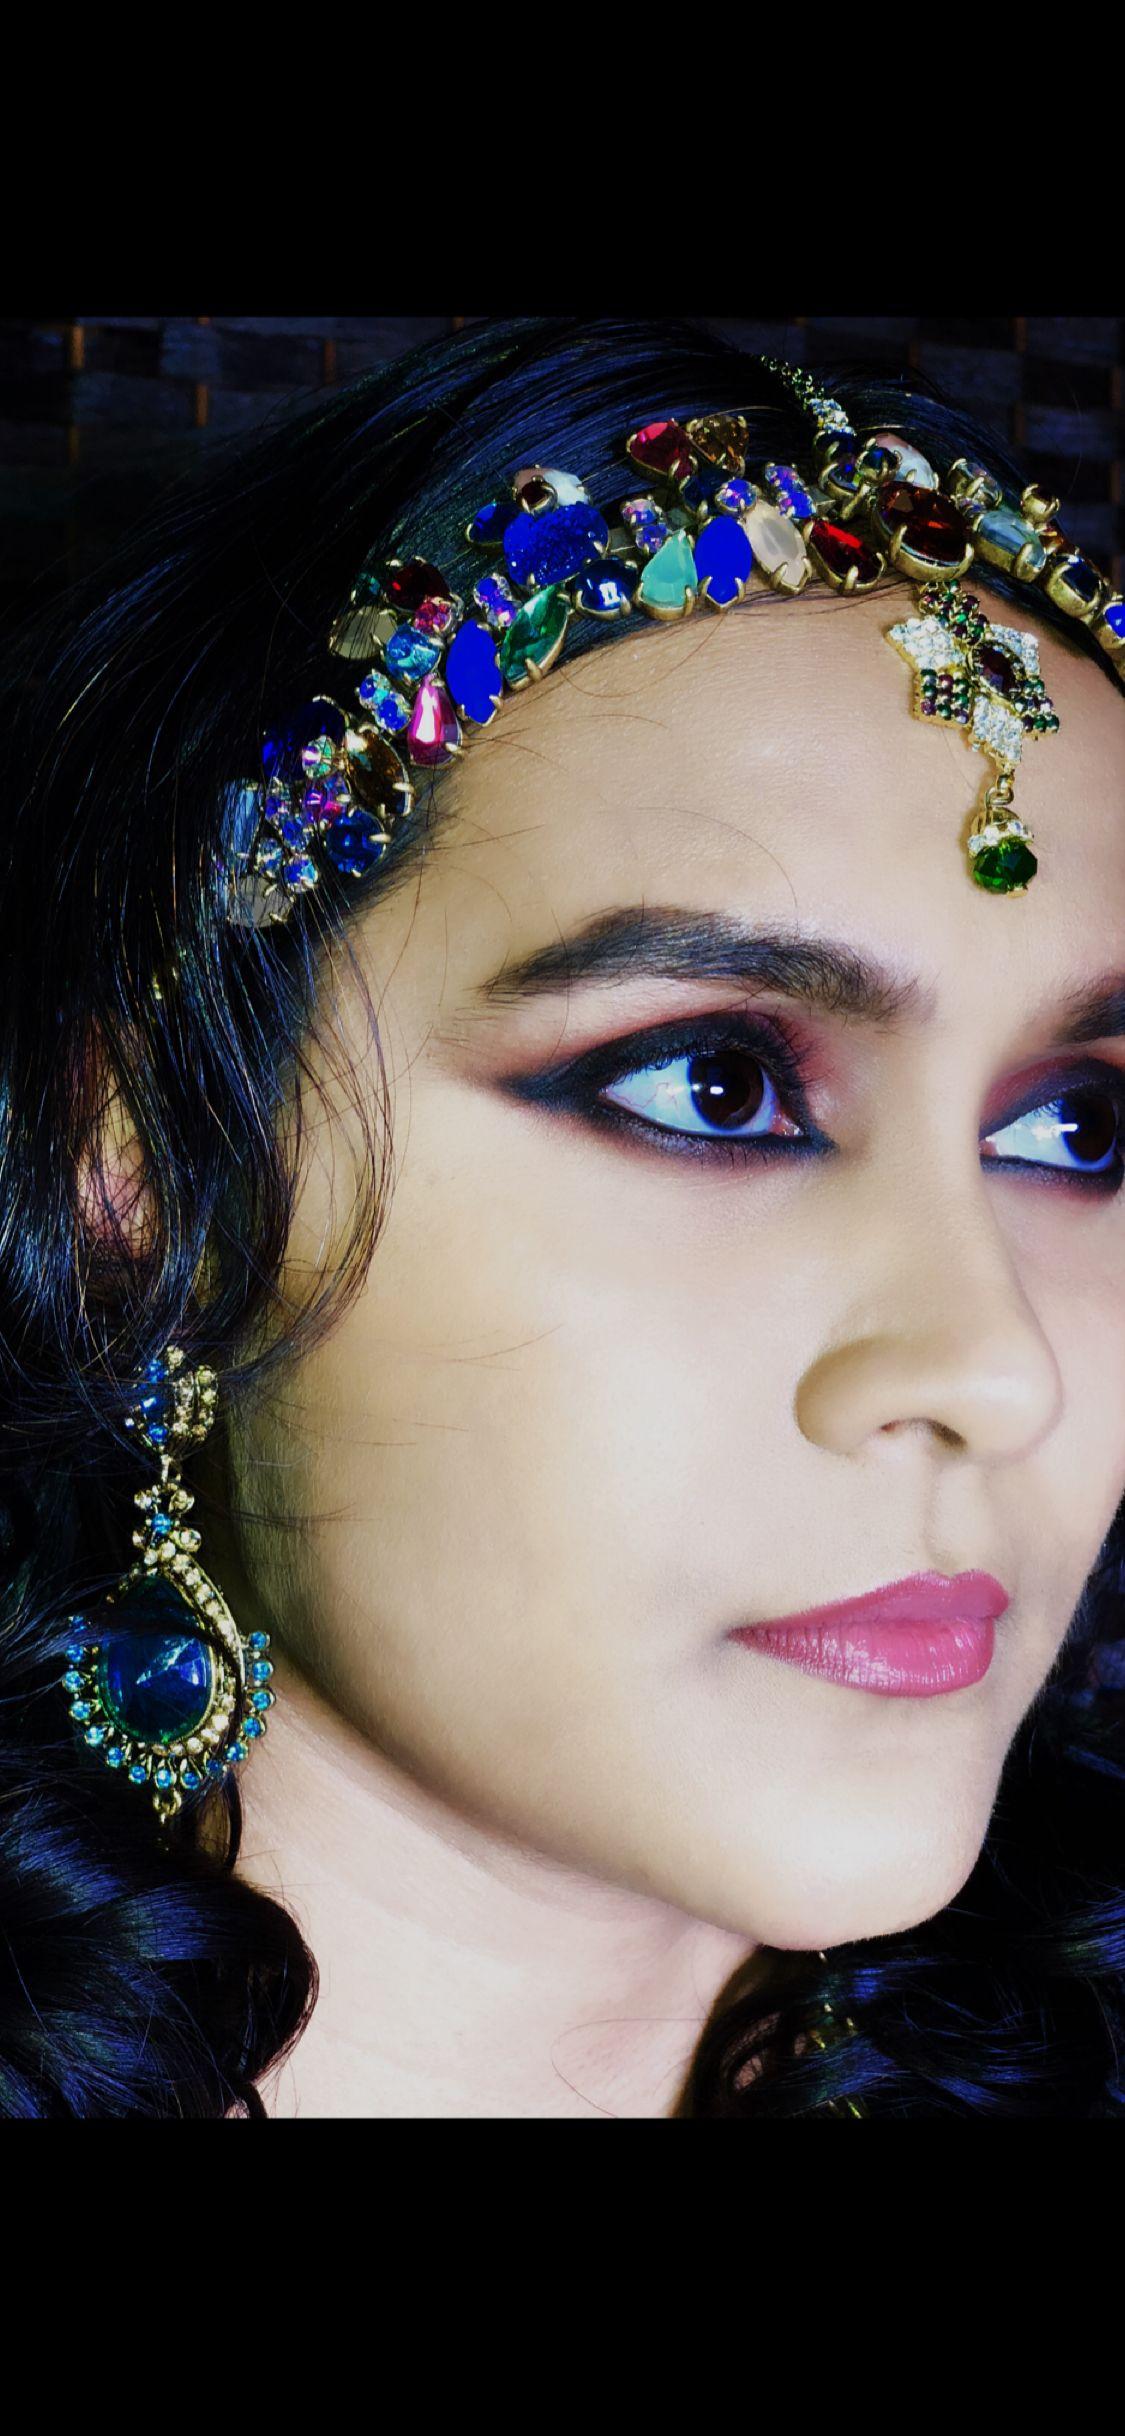 Inspired by Deepika Padukone's look in Padmaavati @mishael ...